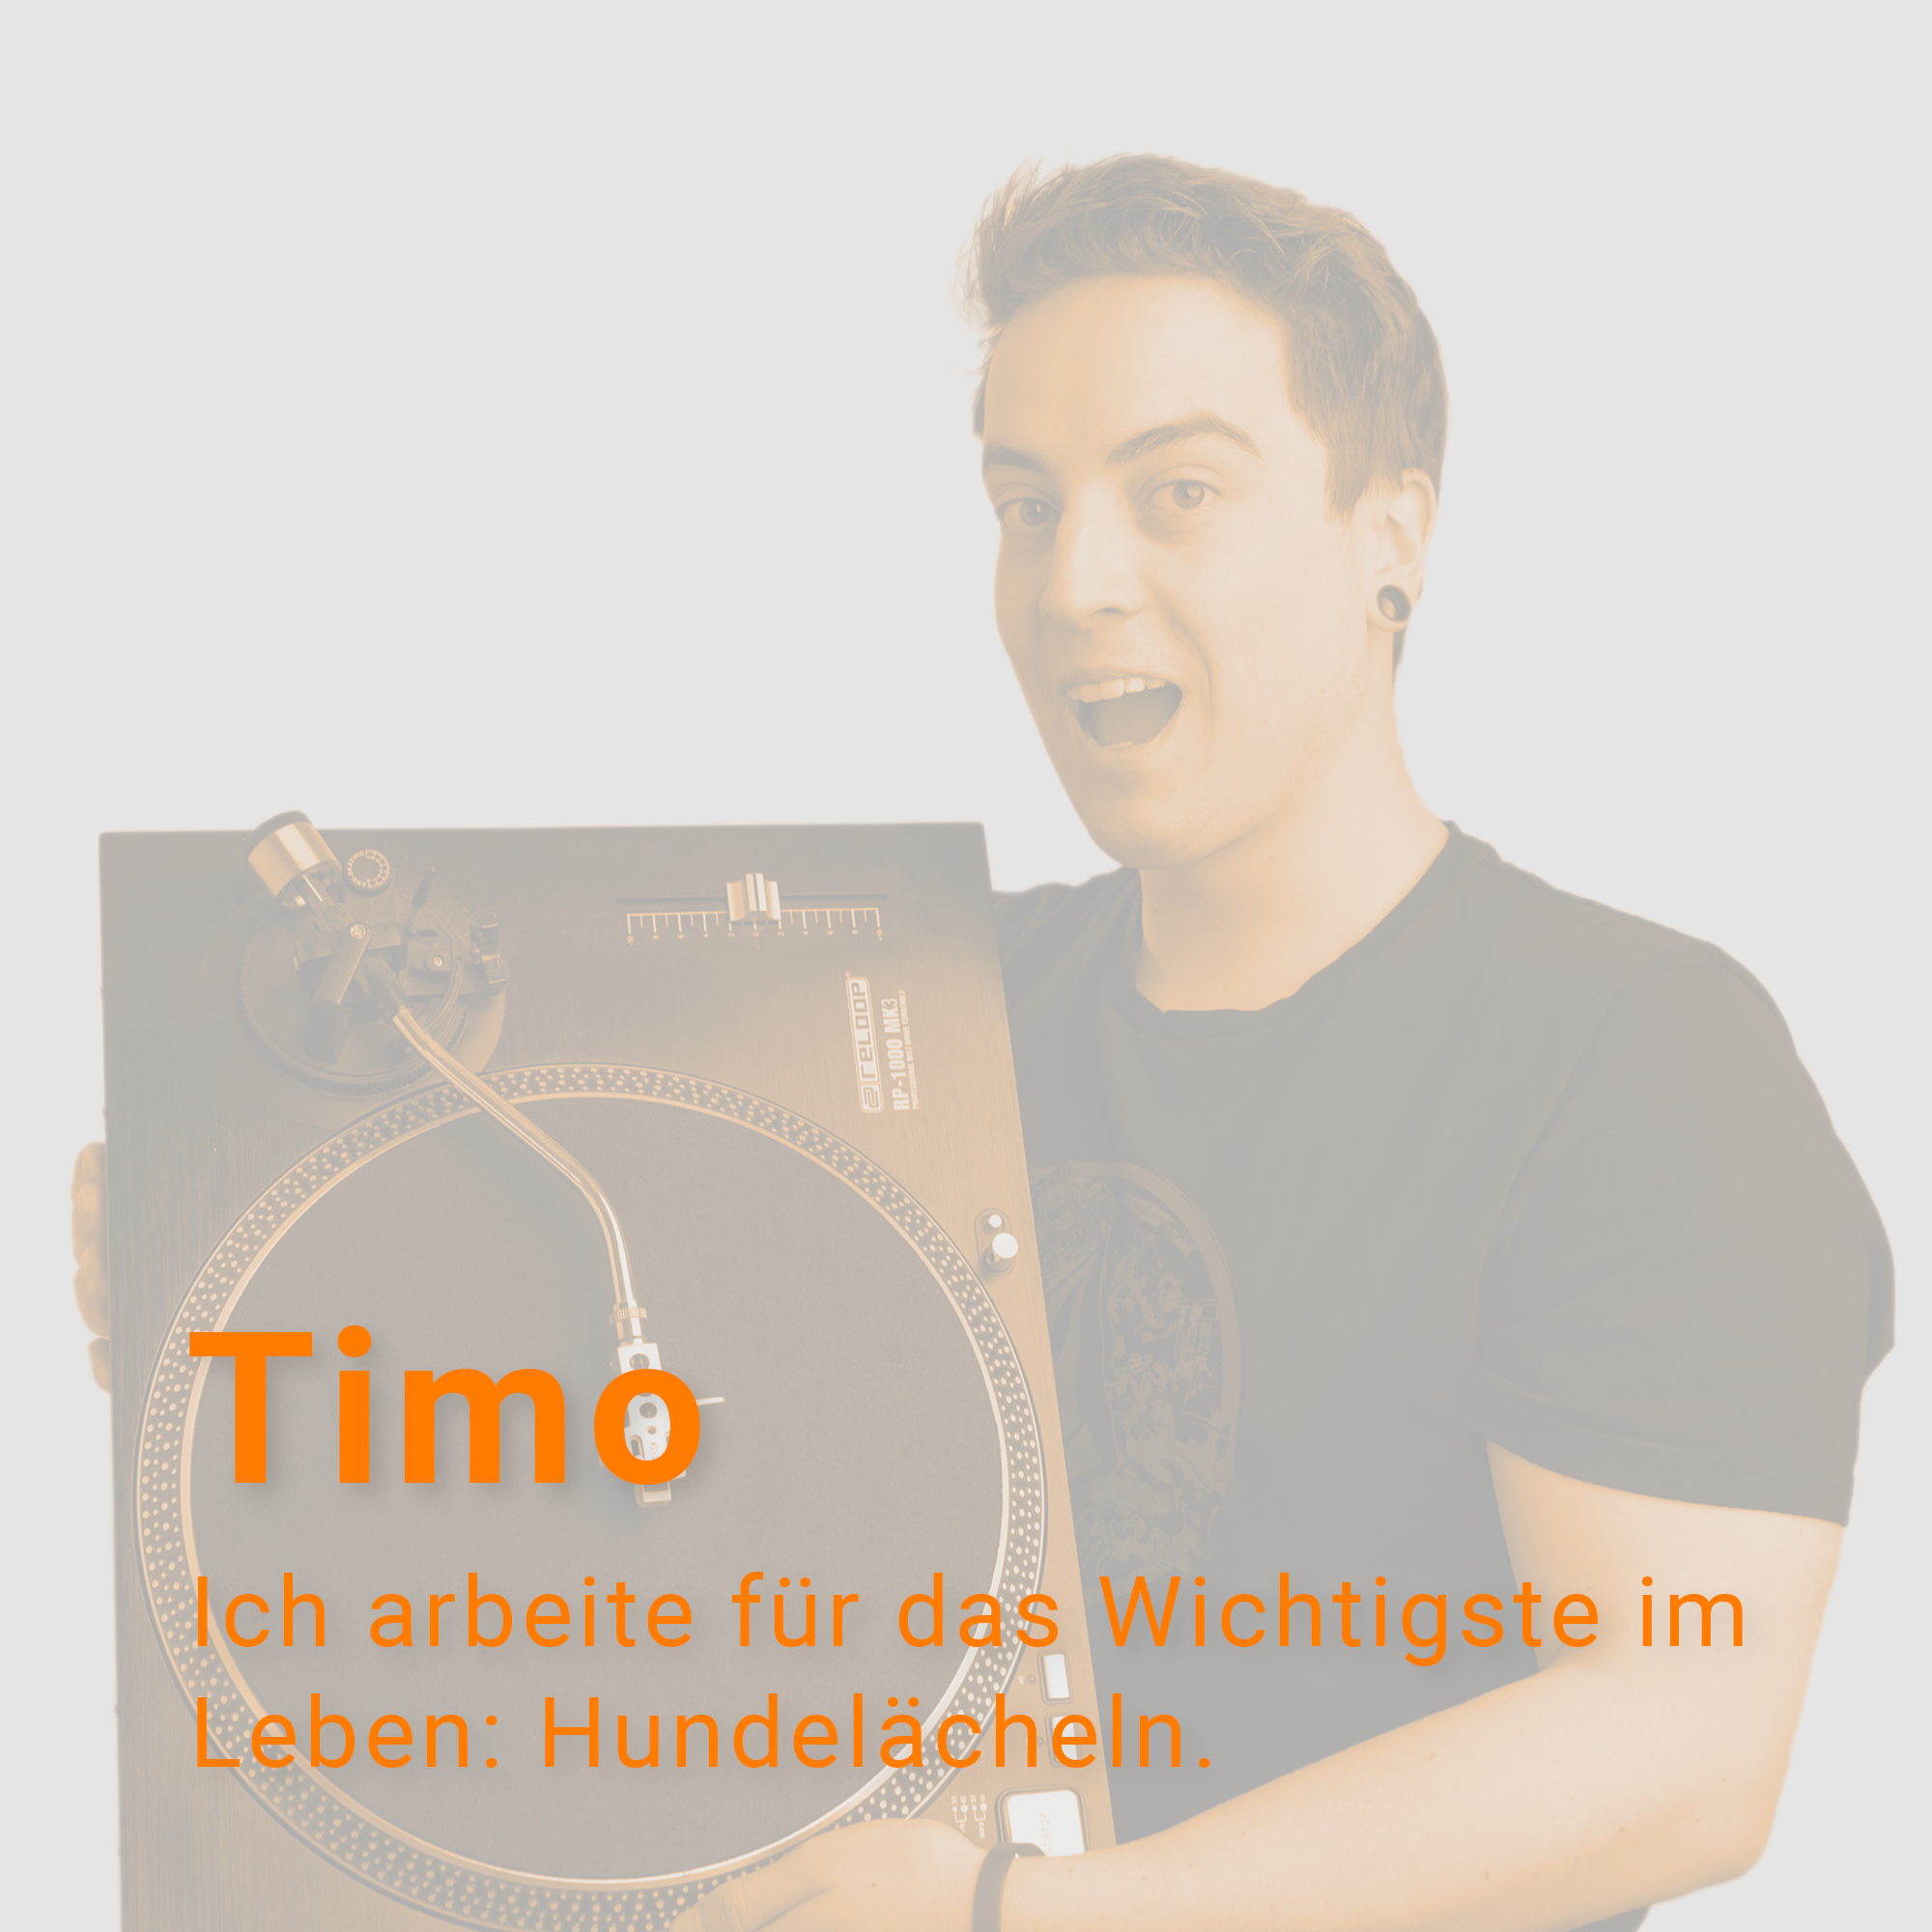 Timo Schallplattenspieler